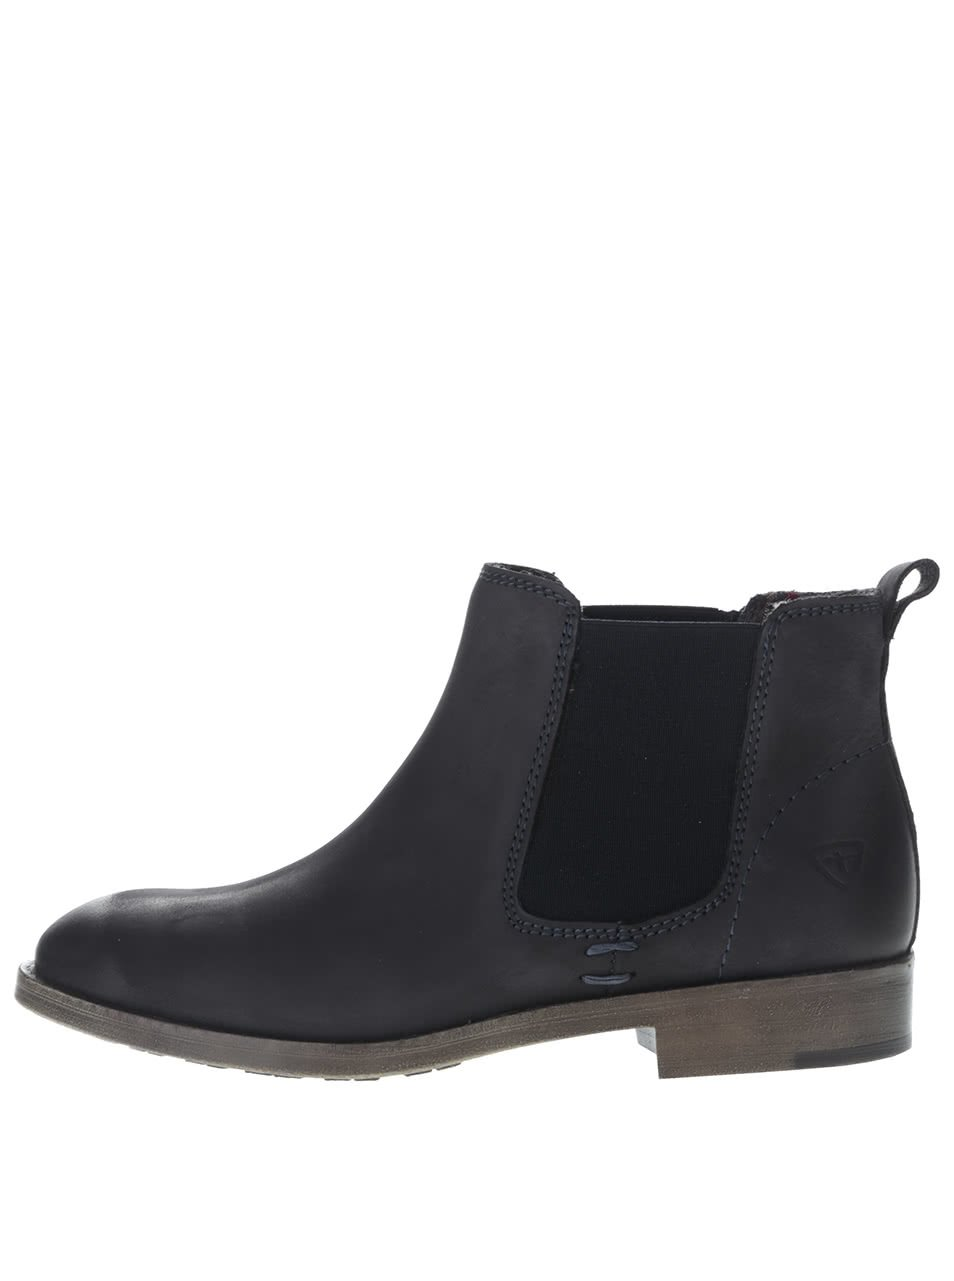 Tmavě modré kožené chelsea boty Tamaris